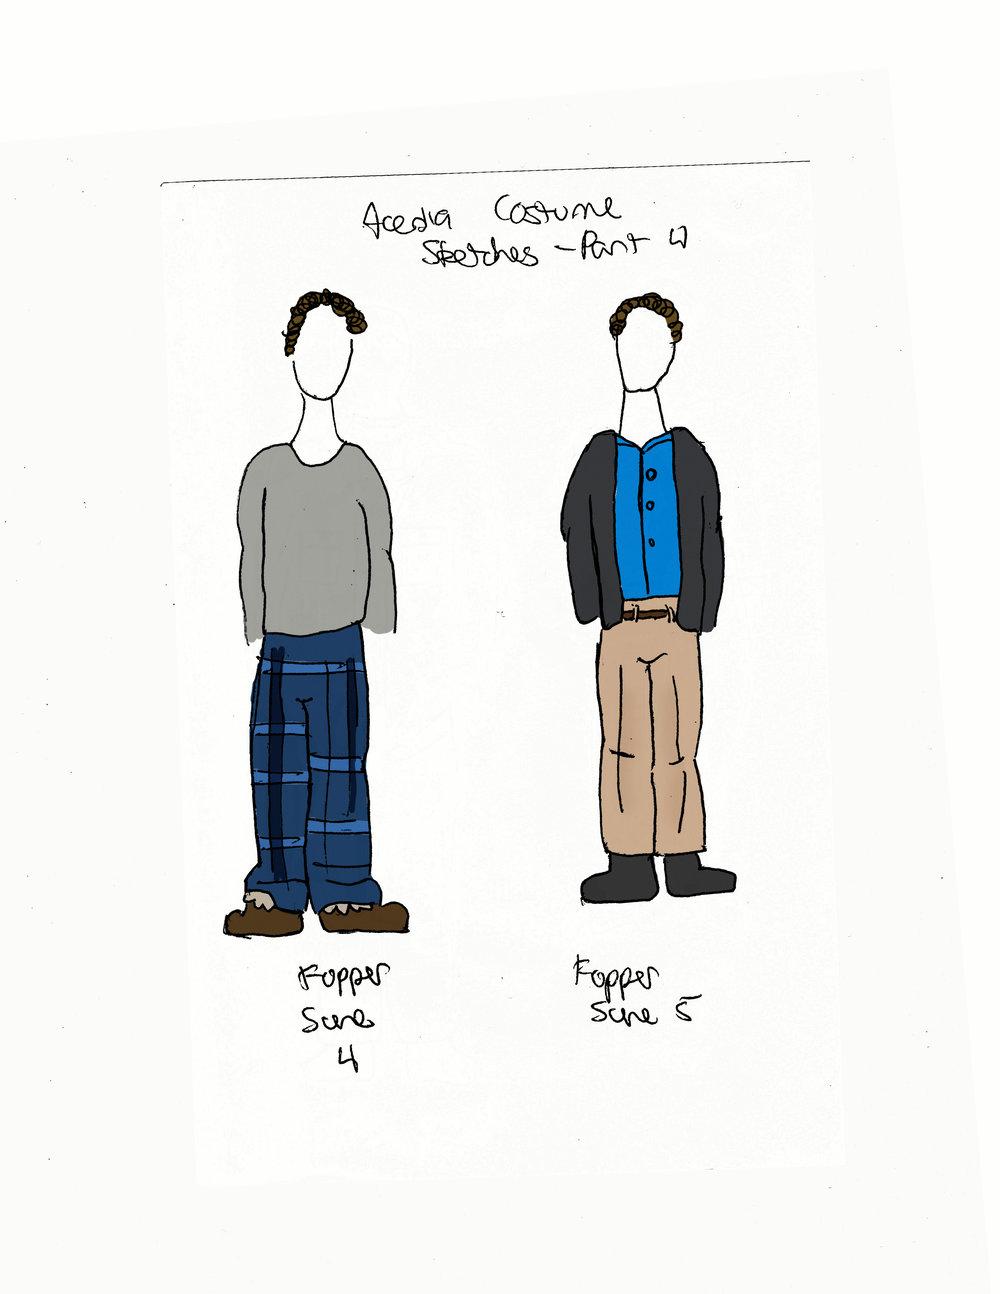 Costumes_Acedia_003.jpg